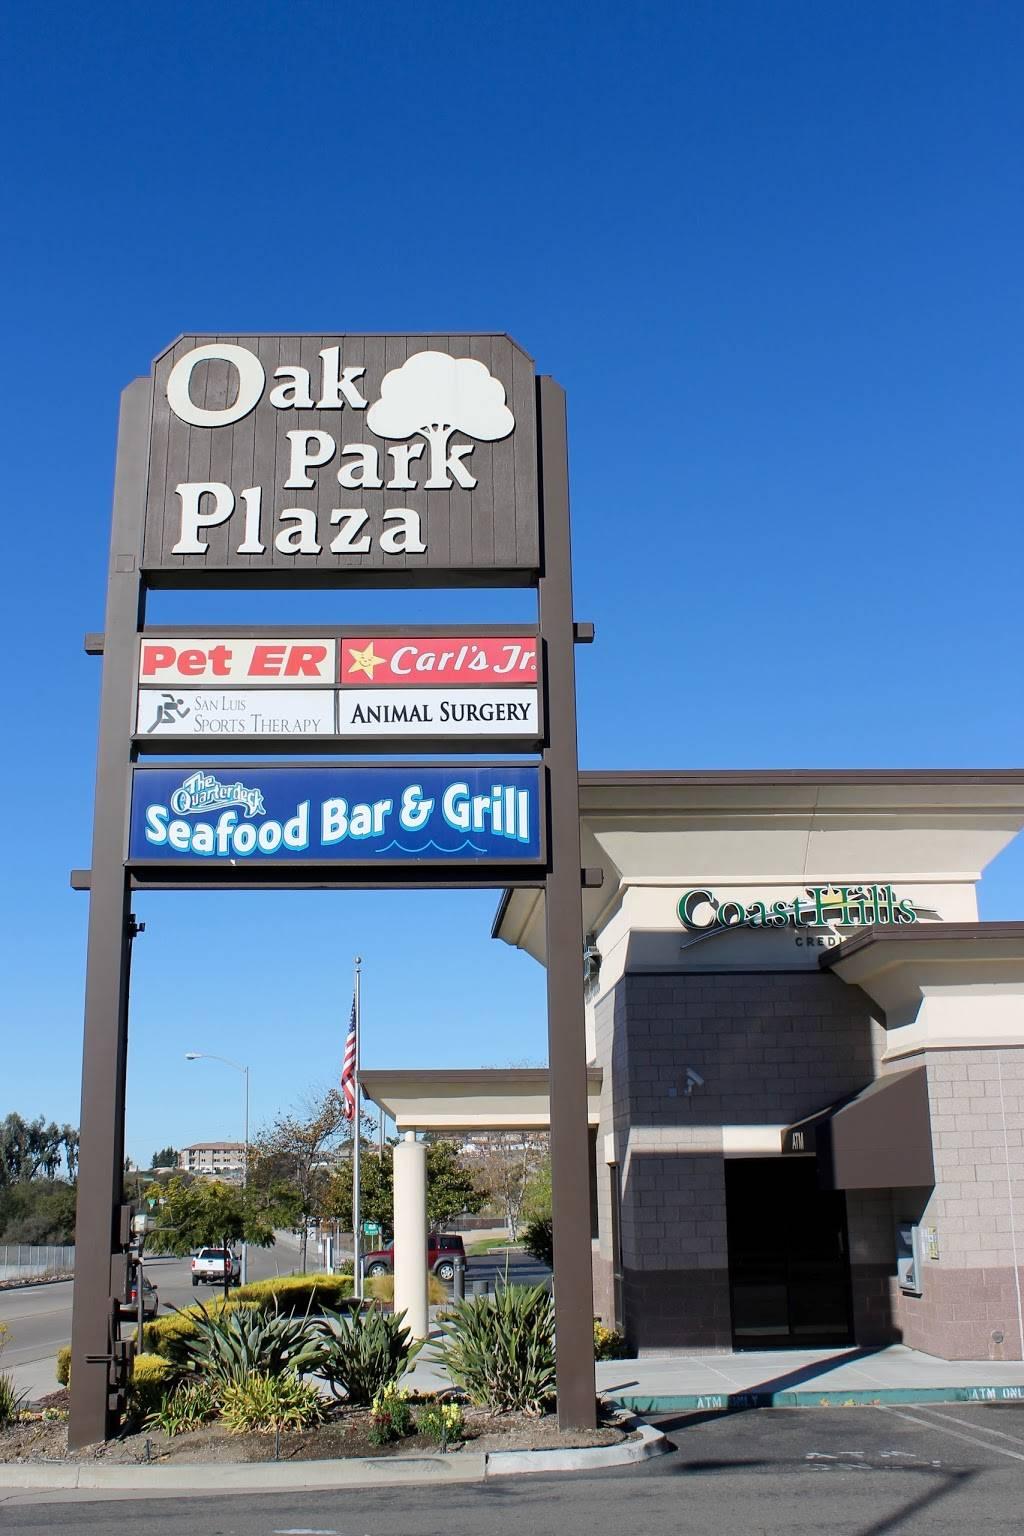 Oak Park Plaza | shopping mall | 1510-1566 W Branch St, Arroyo Grande, CA 93420, USA | 8052956562 OR +1 805-295-6562